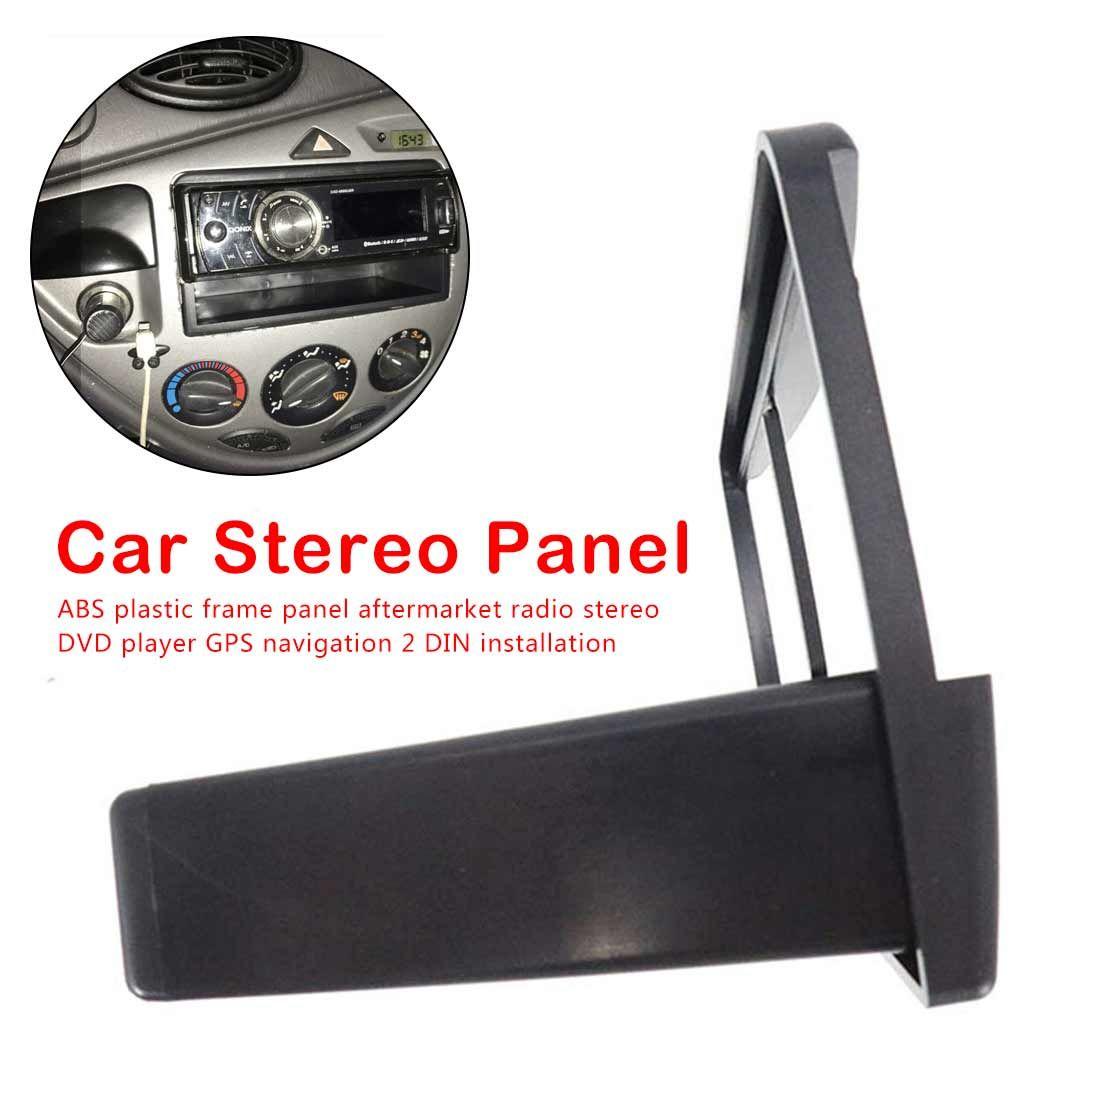 Fiesta Radio Stereo Black Fascia Adapter Plate Surround